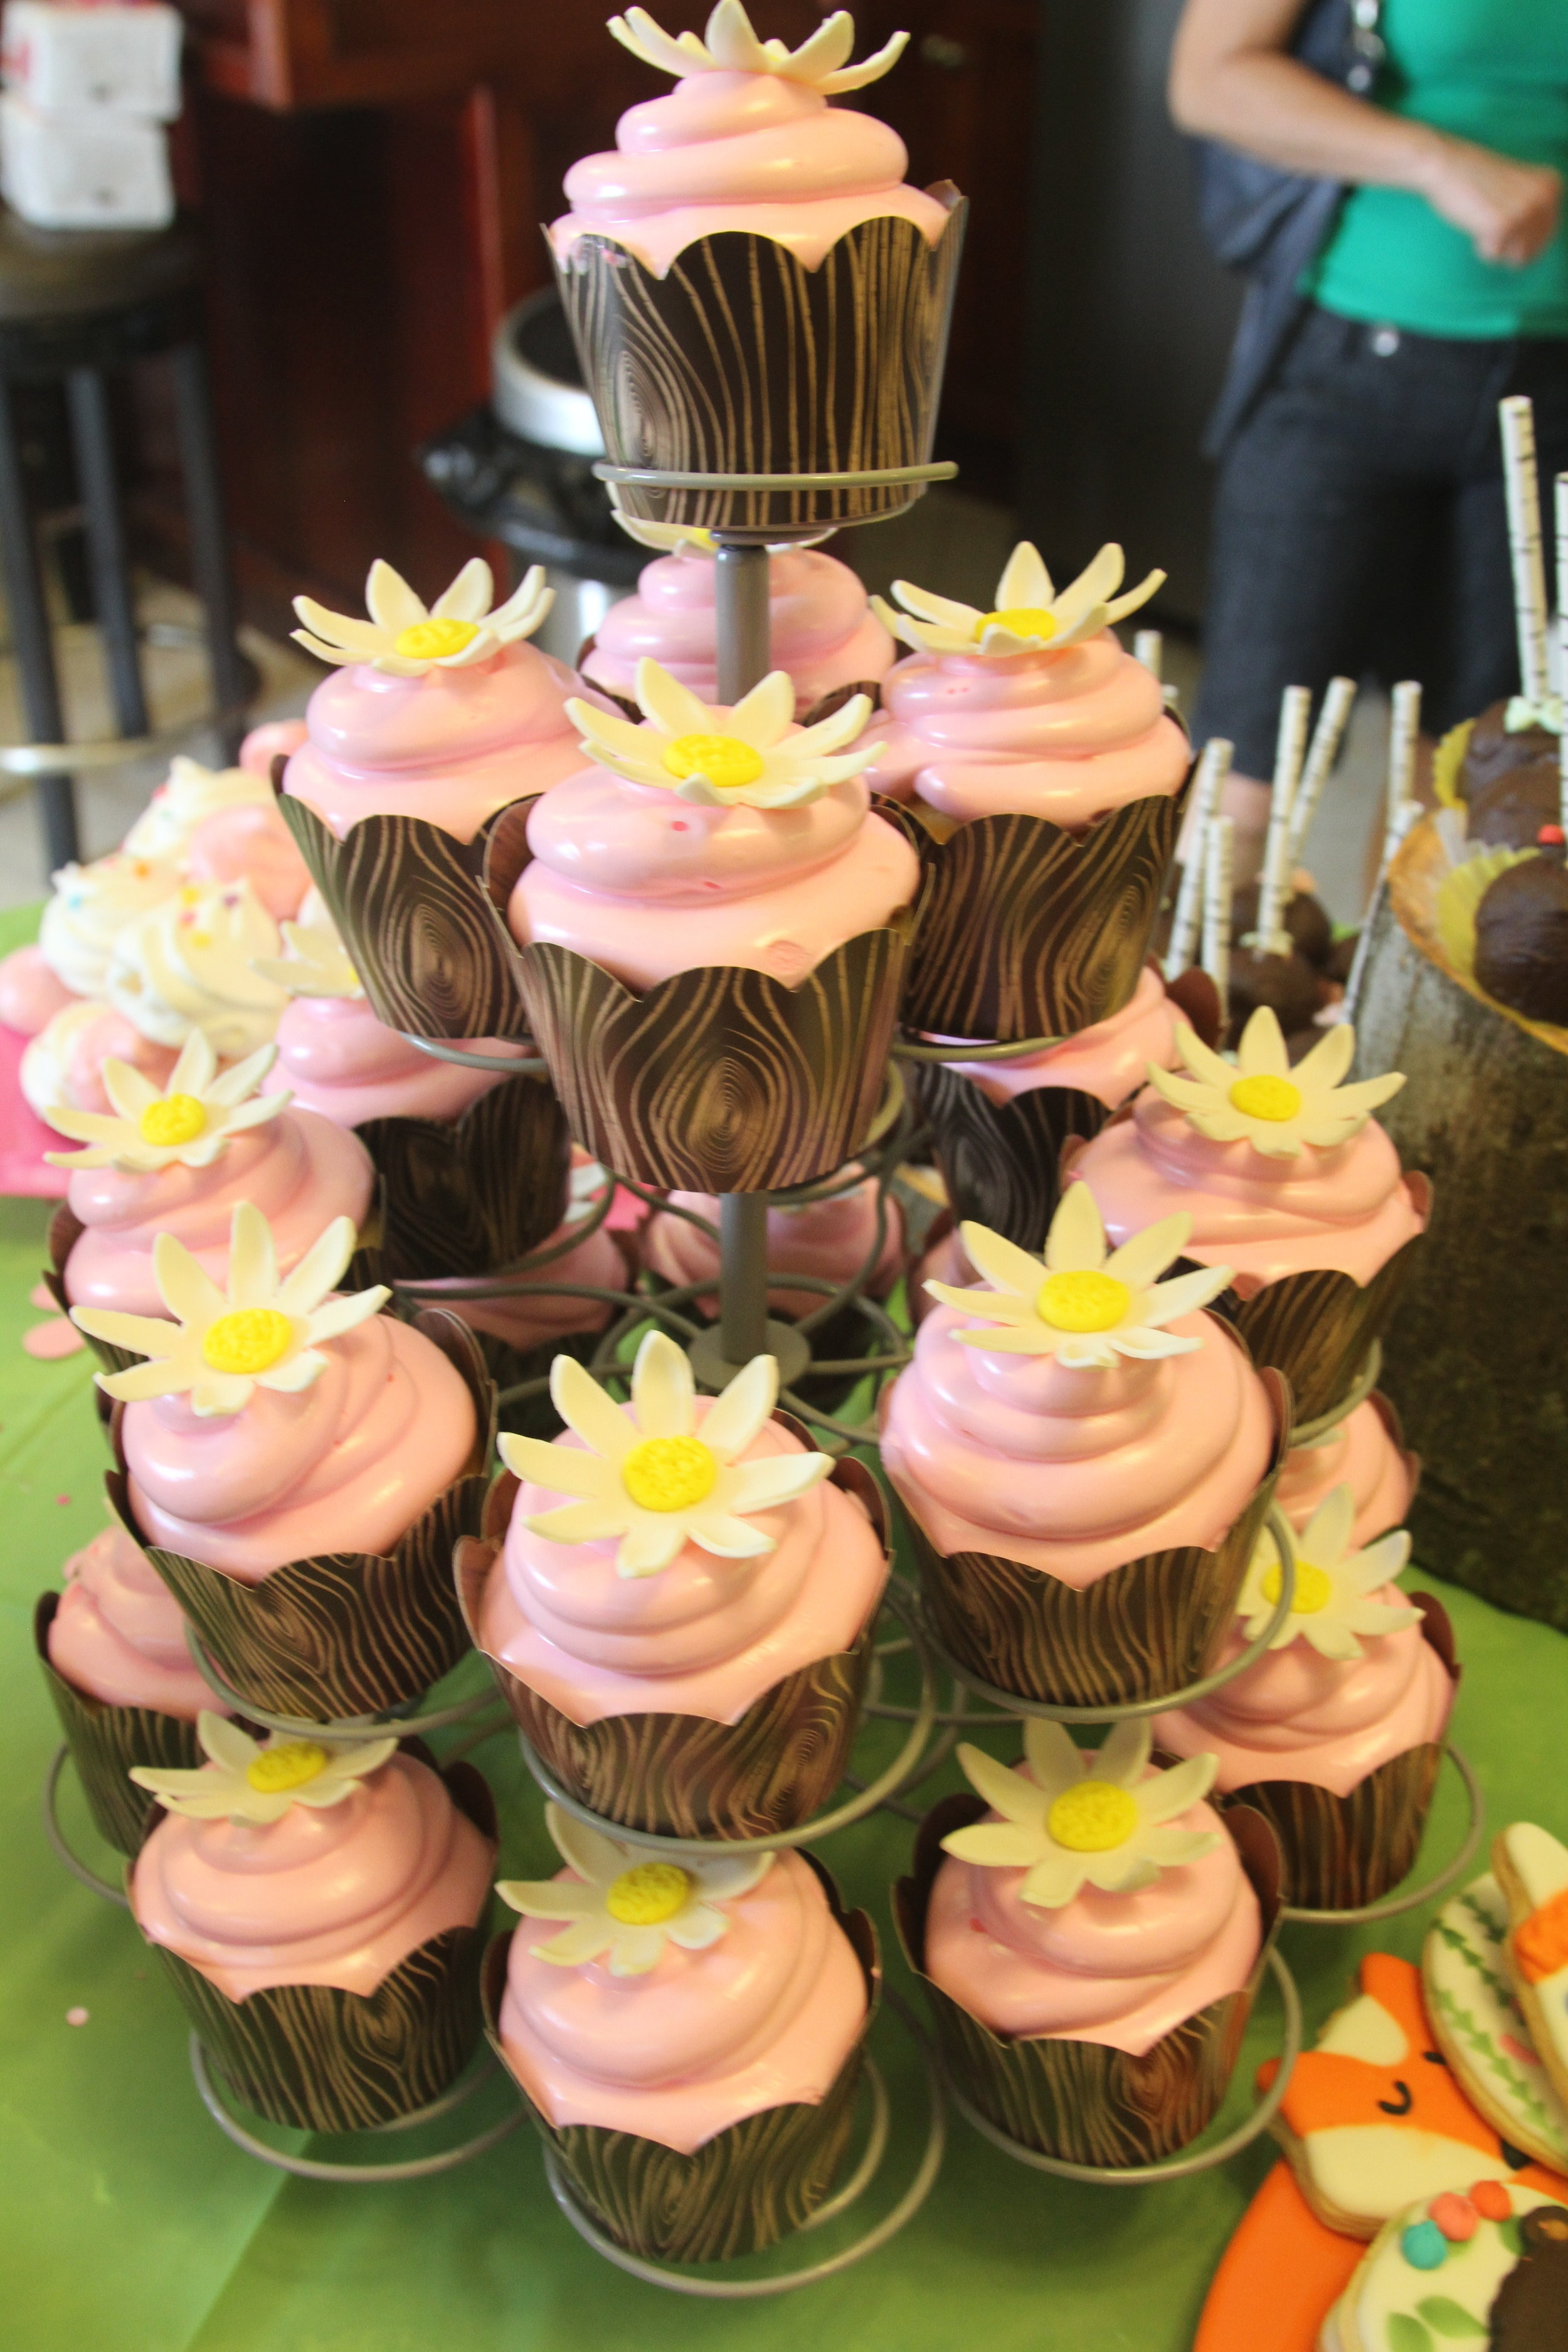 cupcake tower cupcakes pink daisy fondant flower shower party celebrate lemon meringue